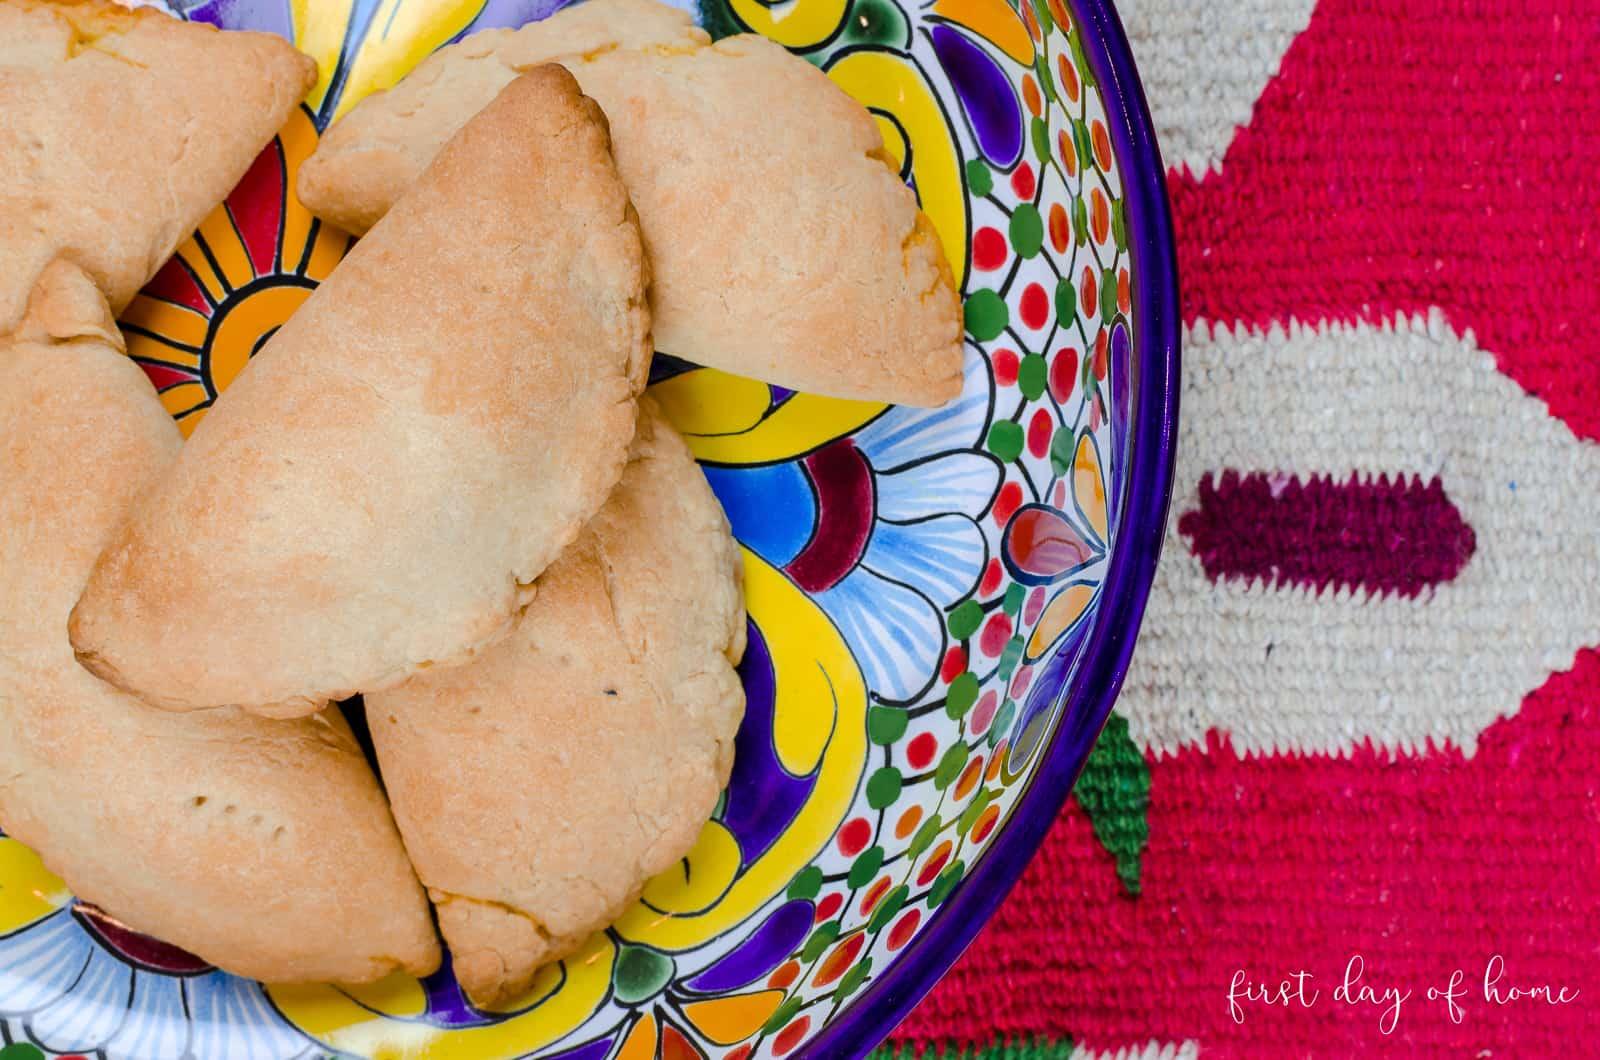 Mexican baked empanadas using family recipe